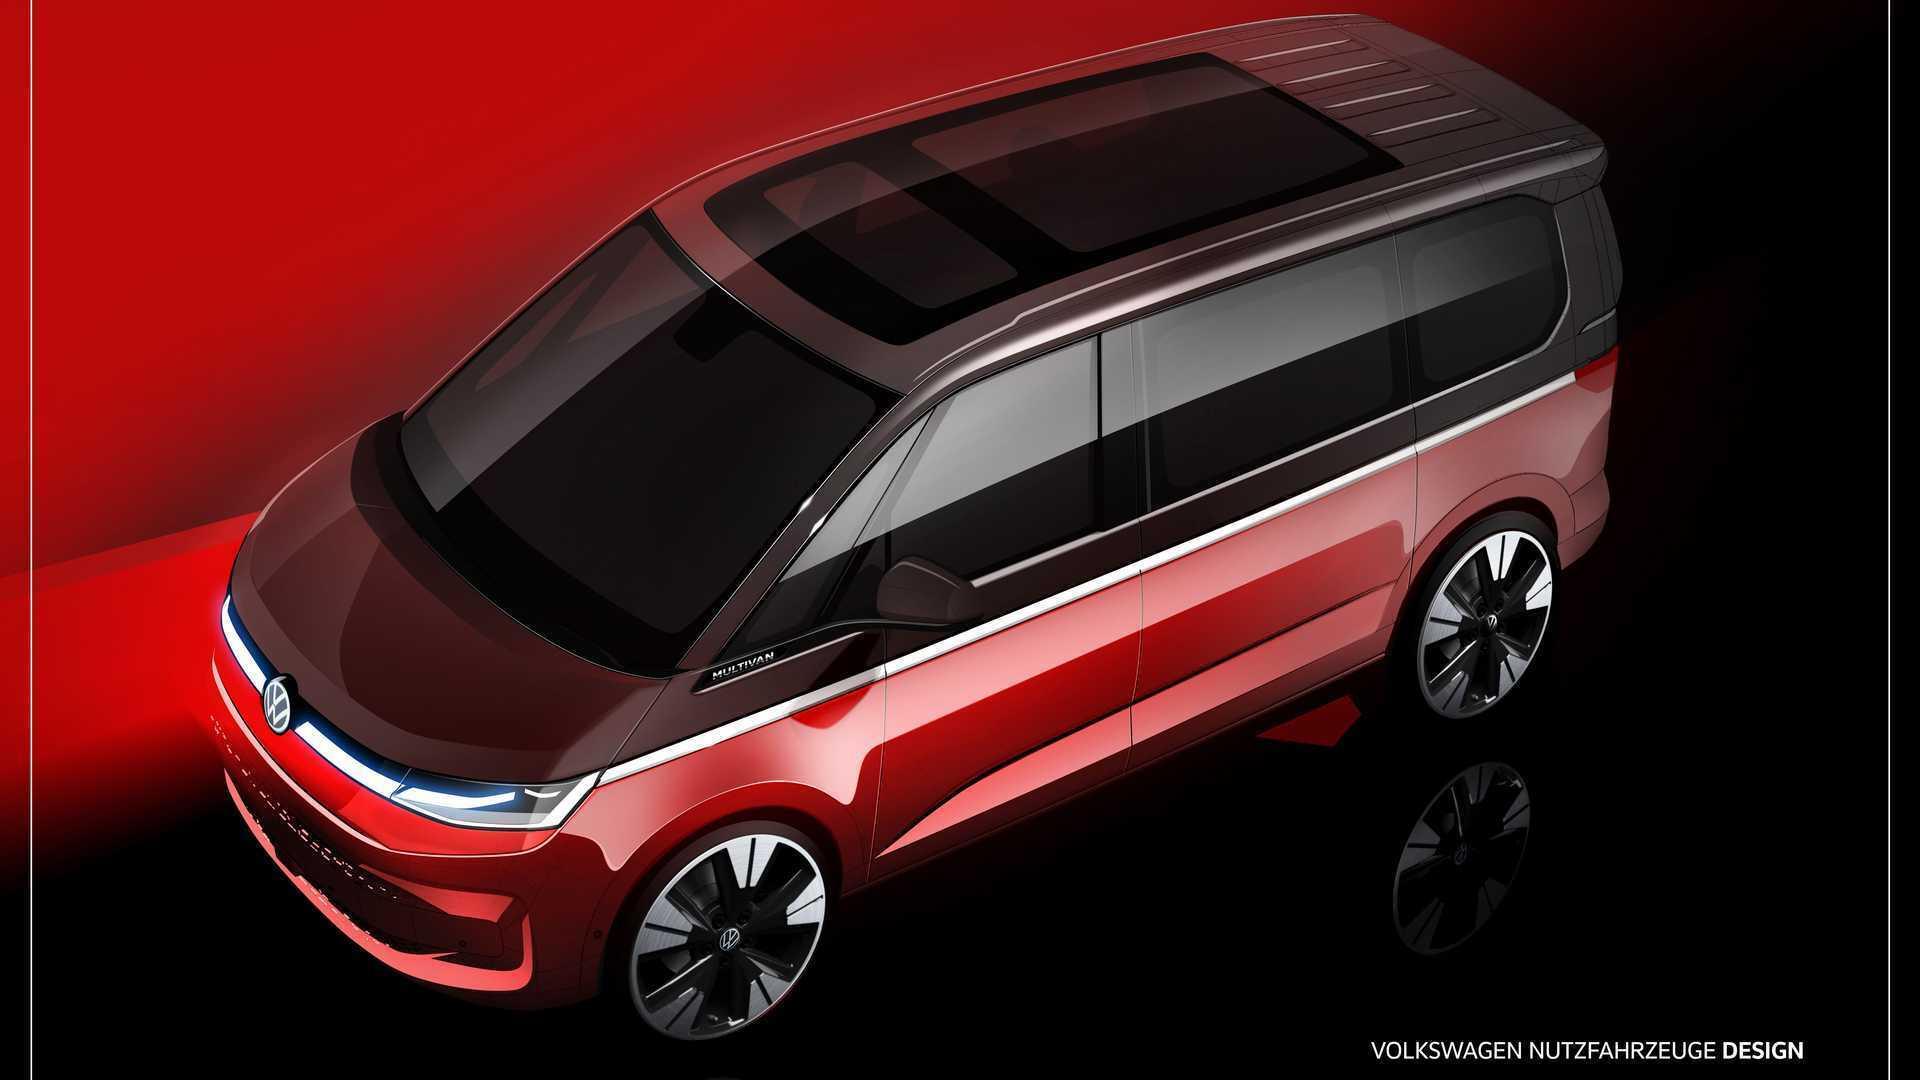 Внешний вид Volkswagen T7 Multivan